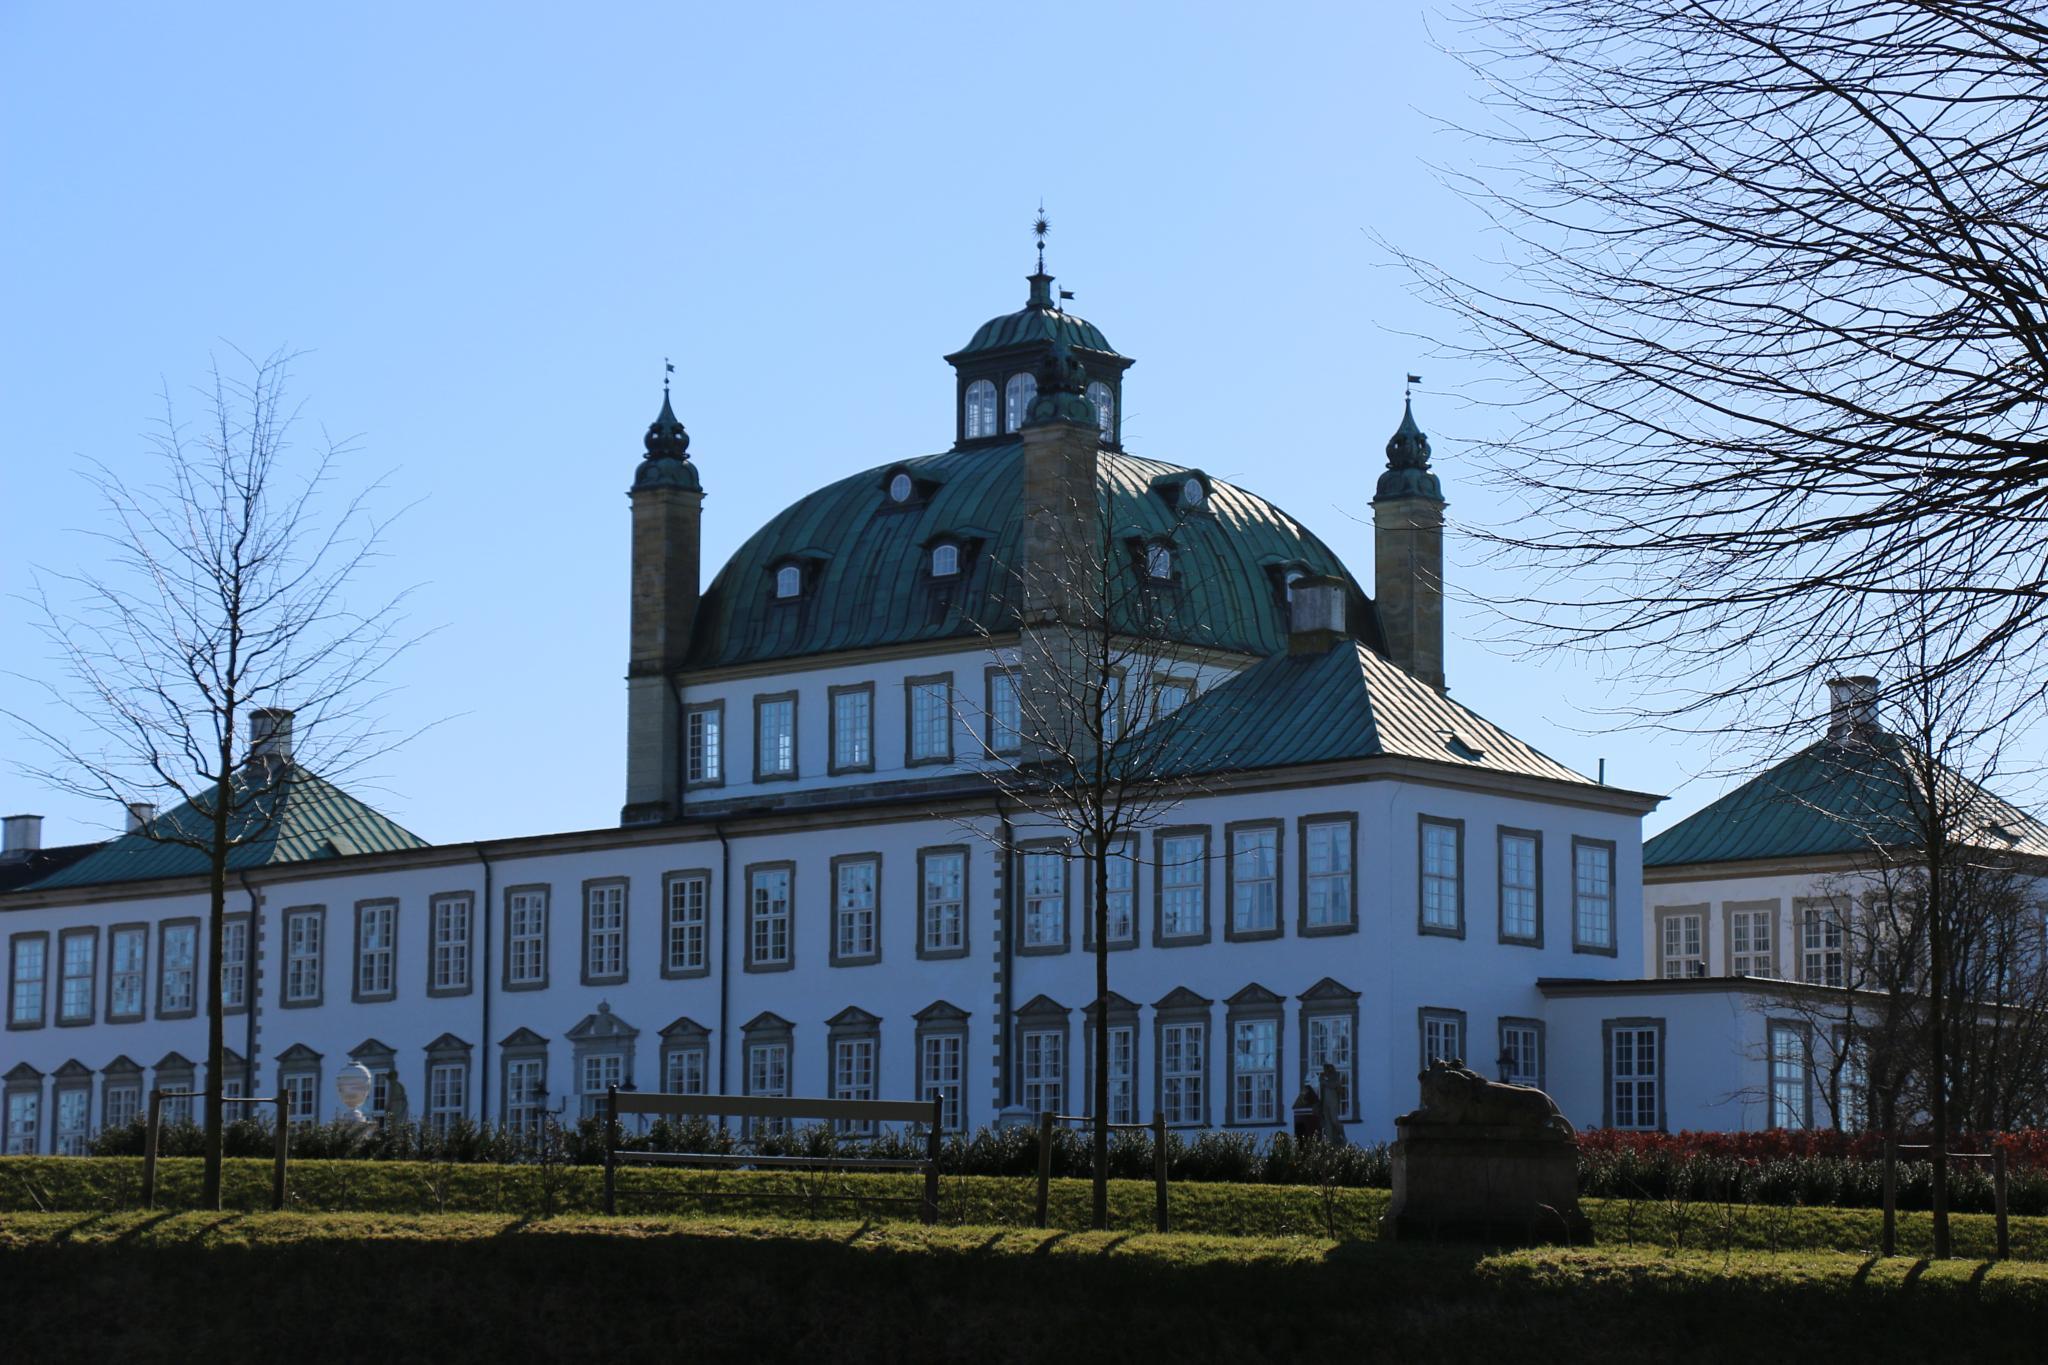 Kingdom Castle by Karsten Larsen